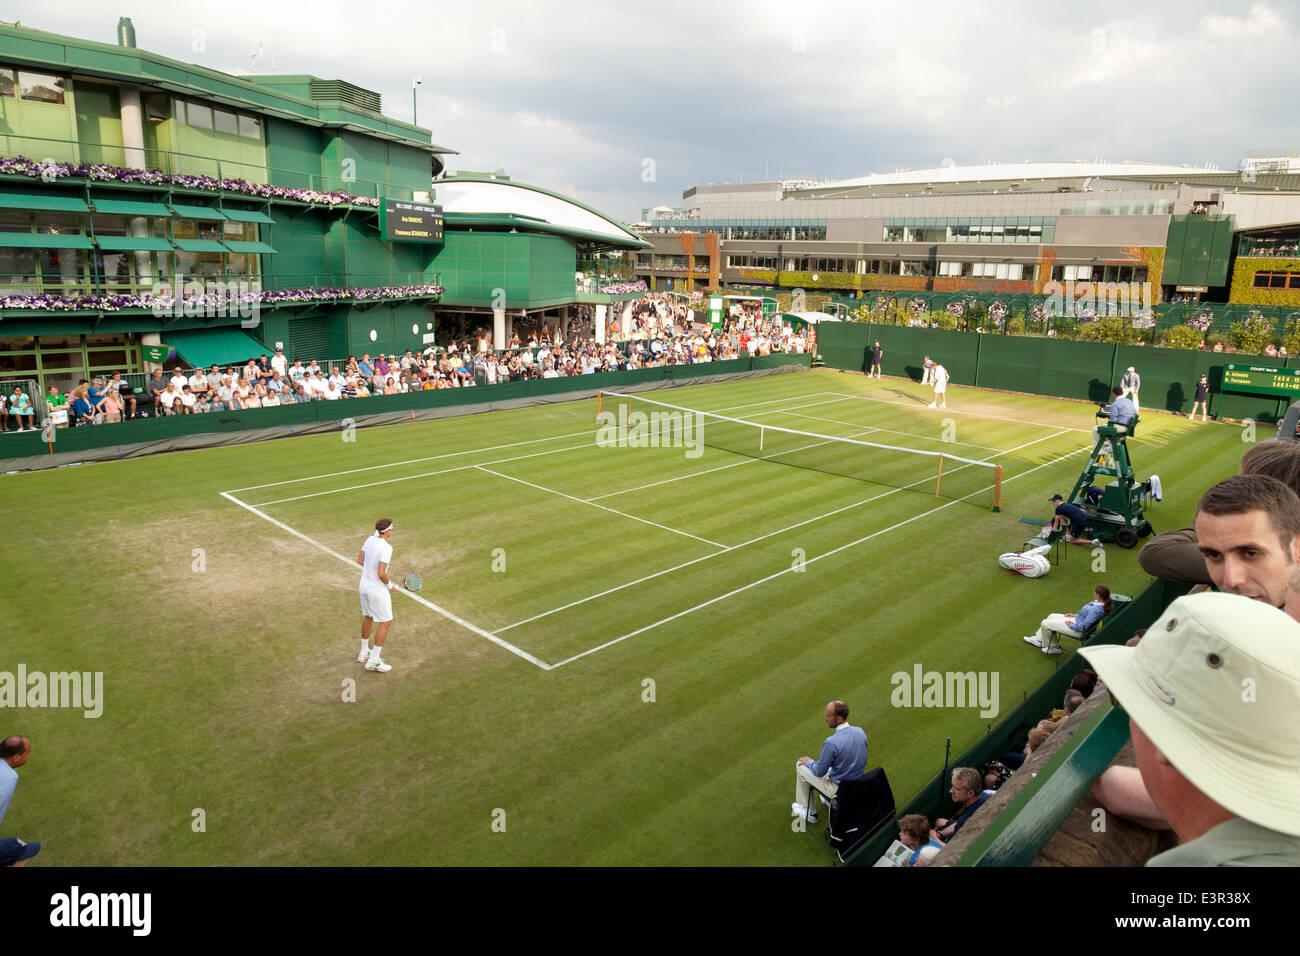 En un partido de tenis fuera del tribunal, el Wimbledon All England Lawn Tennis Club campeonatos de Wimbledon, Londres, Gran Bretaña. Foto de stock